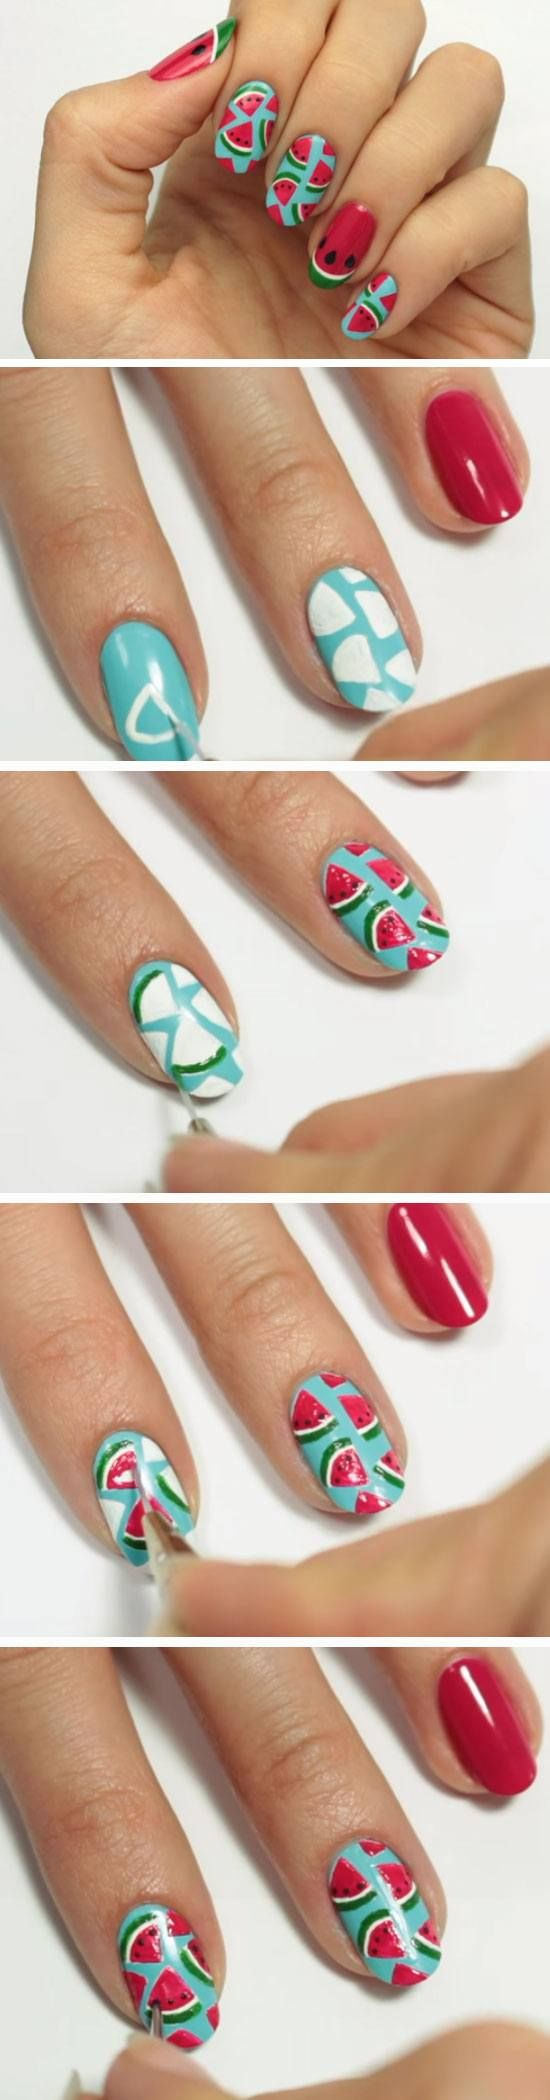 65+Most Eye Catching Beautiful Nail Art Ideas   Flamingo nails ...